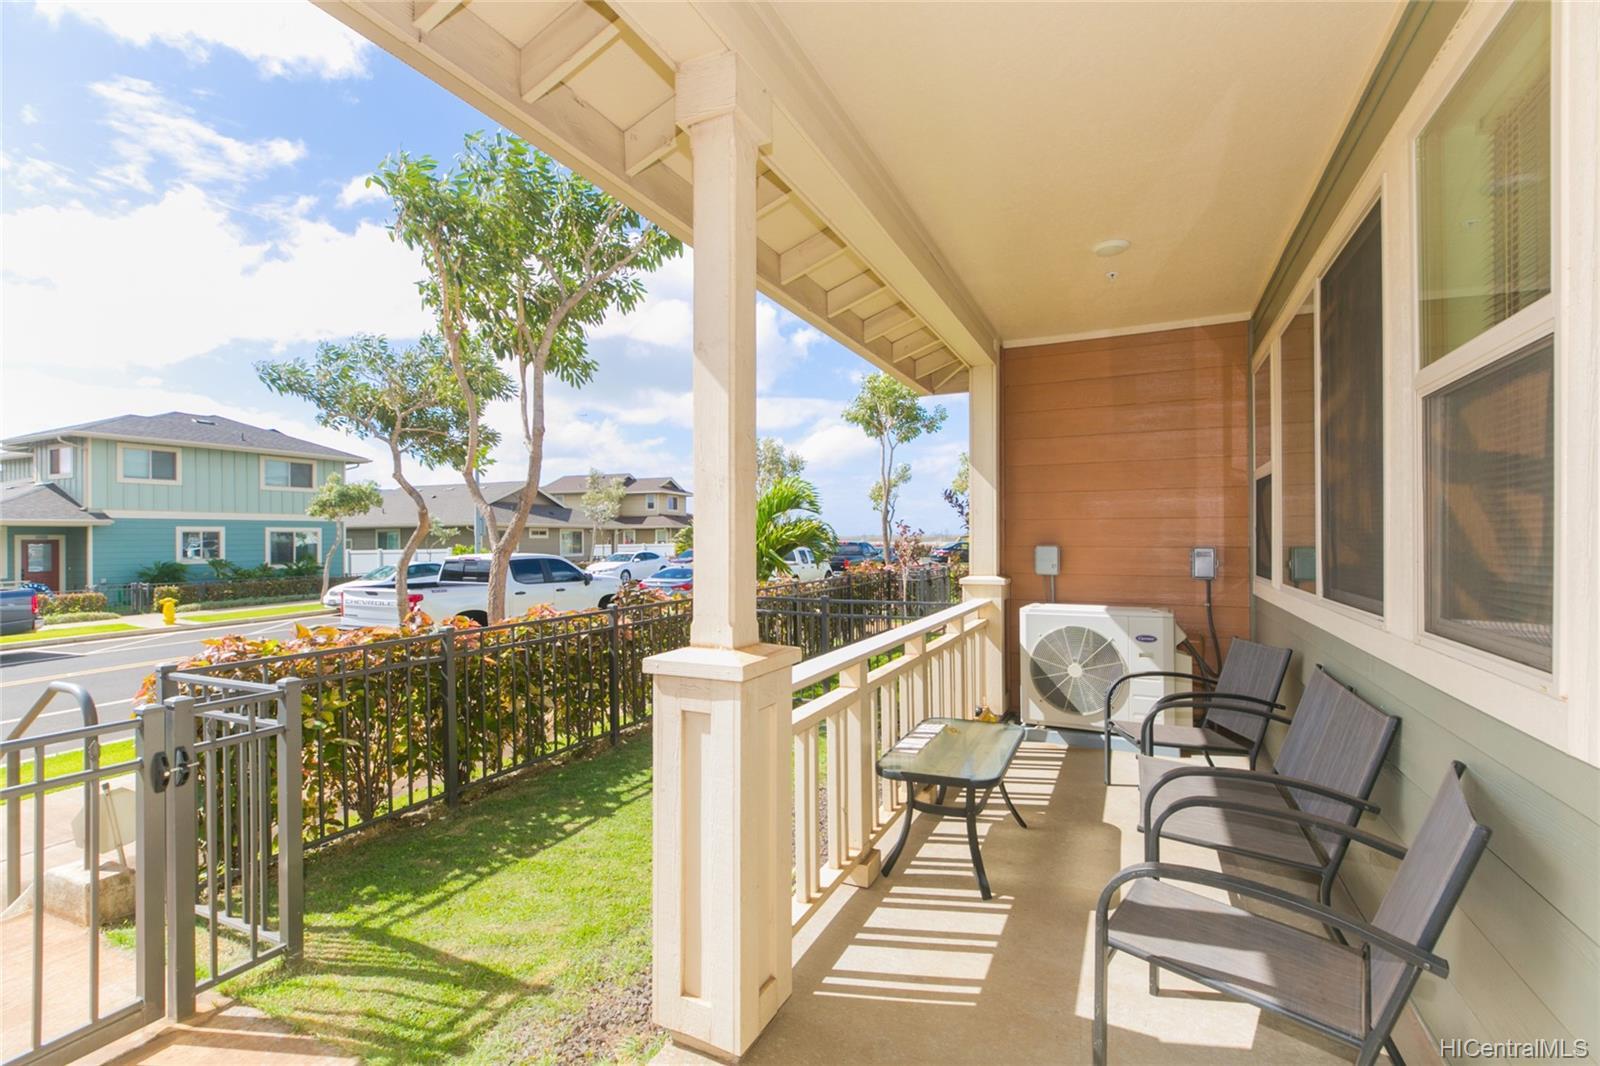 91-1081 Iwikuamoo Street townhouse # 1002, Ewa Beach, Hawaii - photo 21 of 25